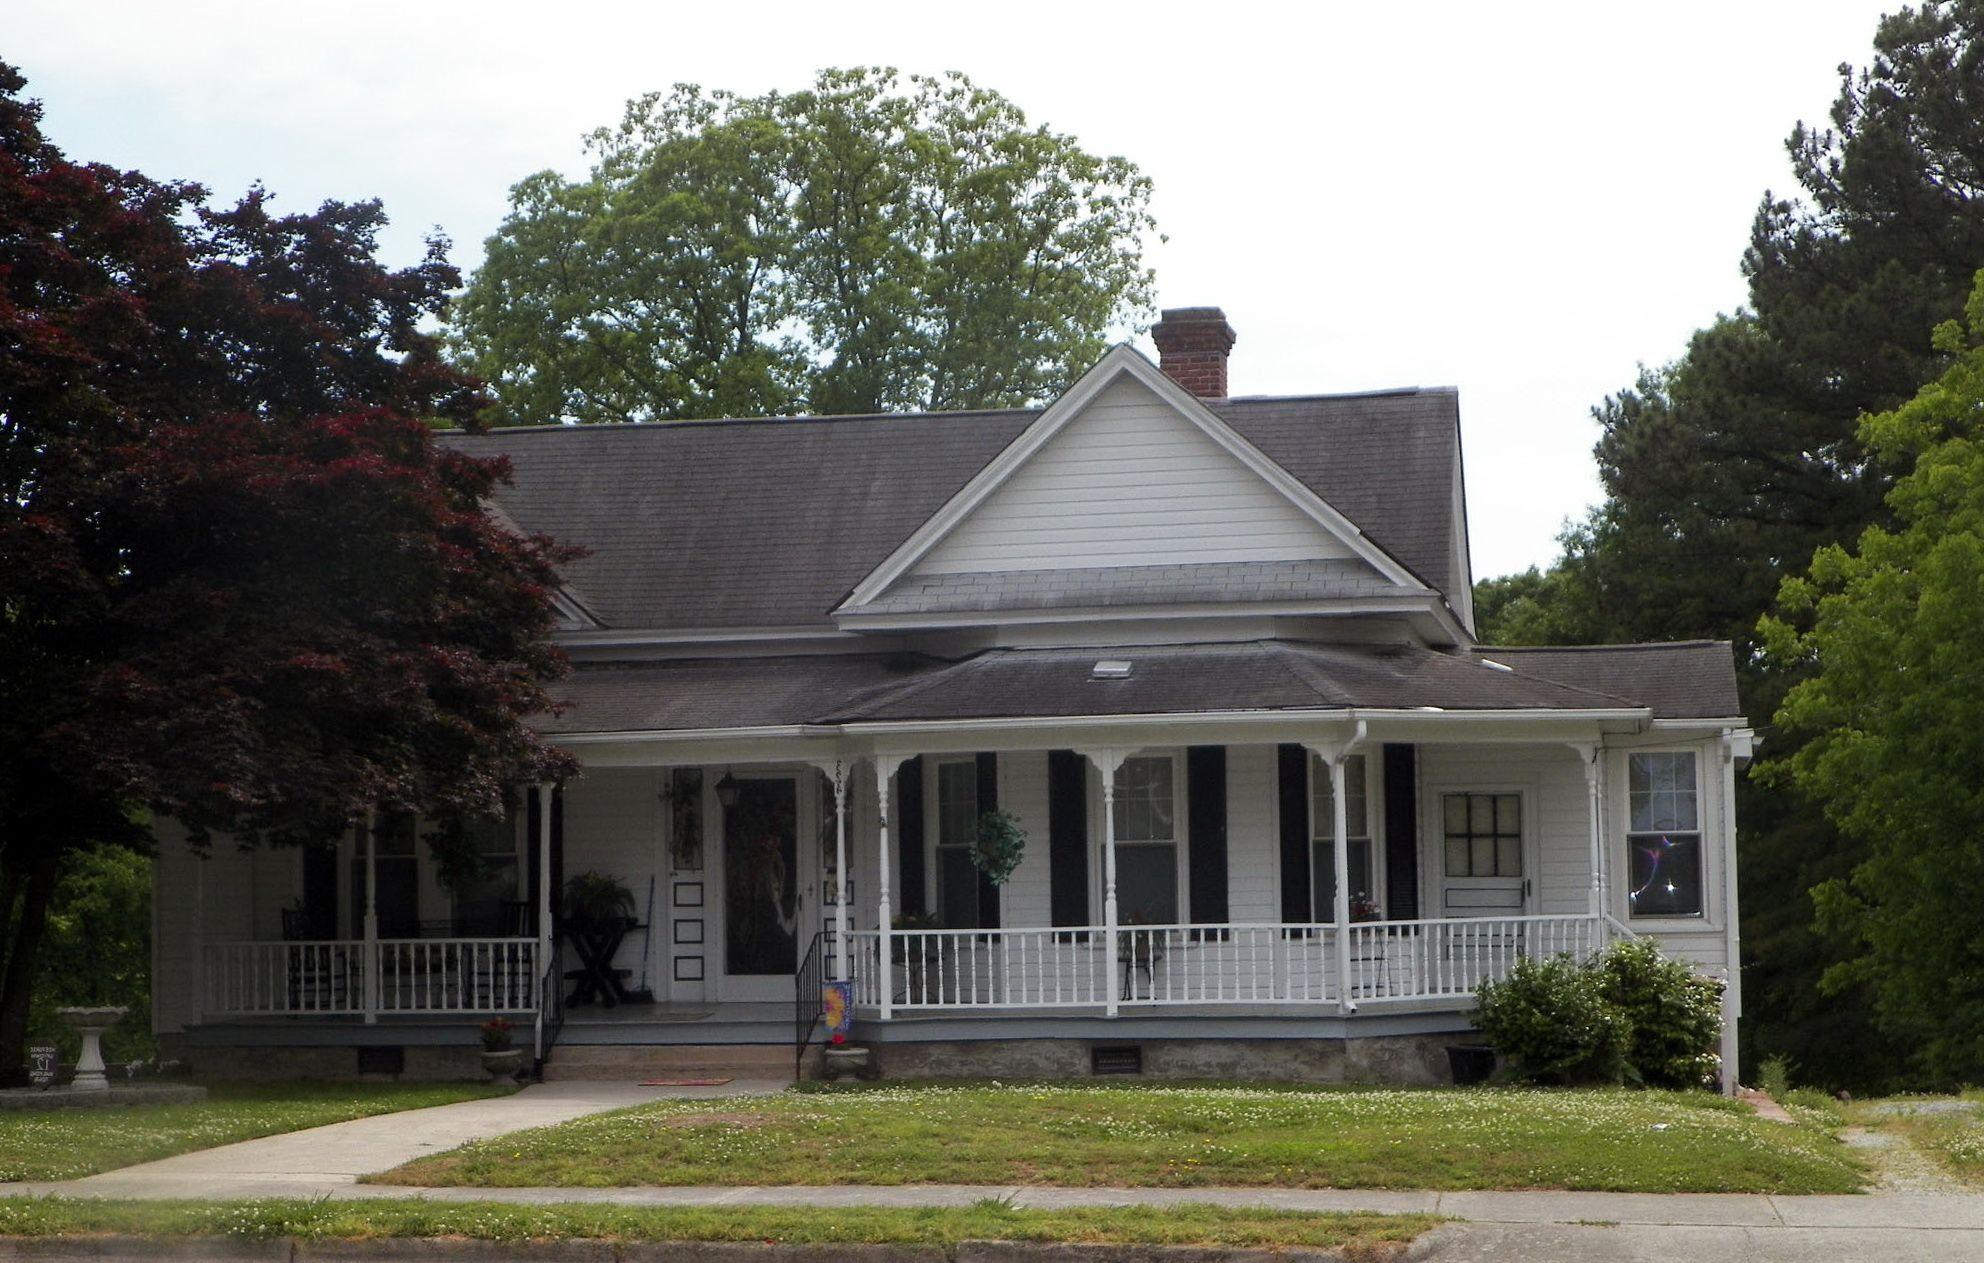 House plans wrap around porch one story do you suppose